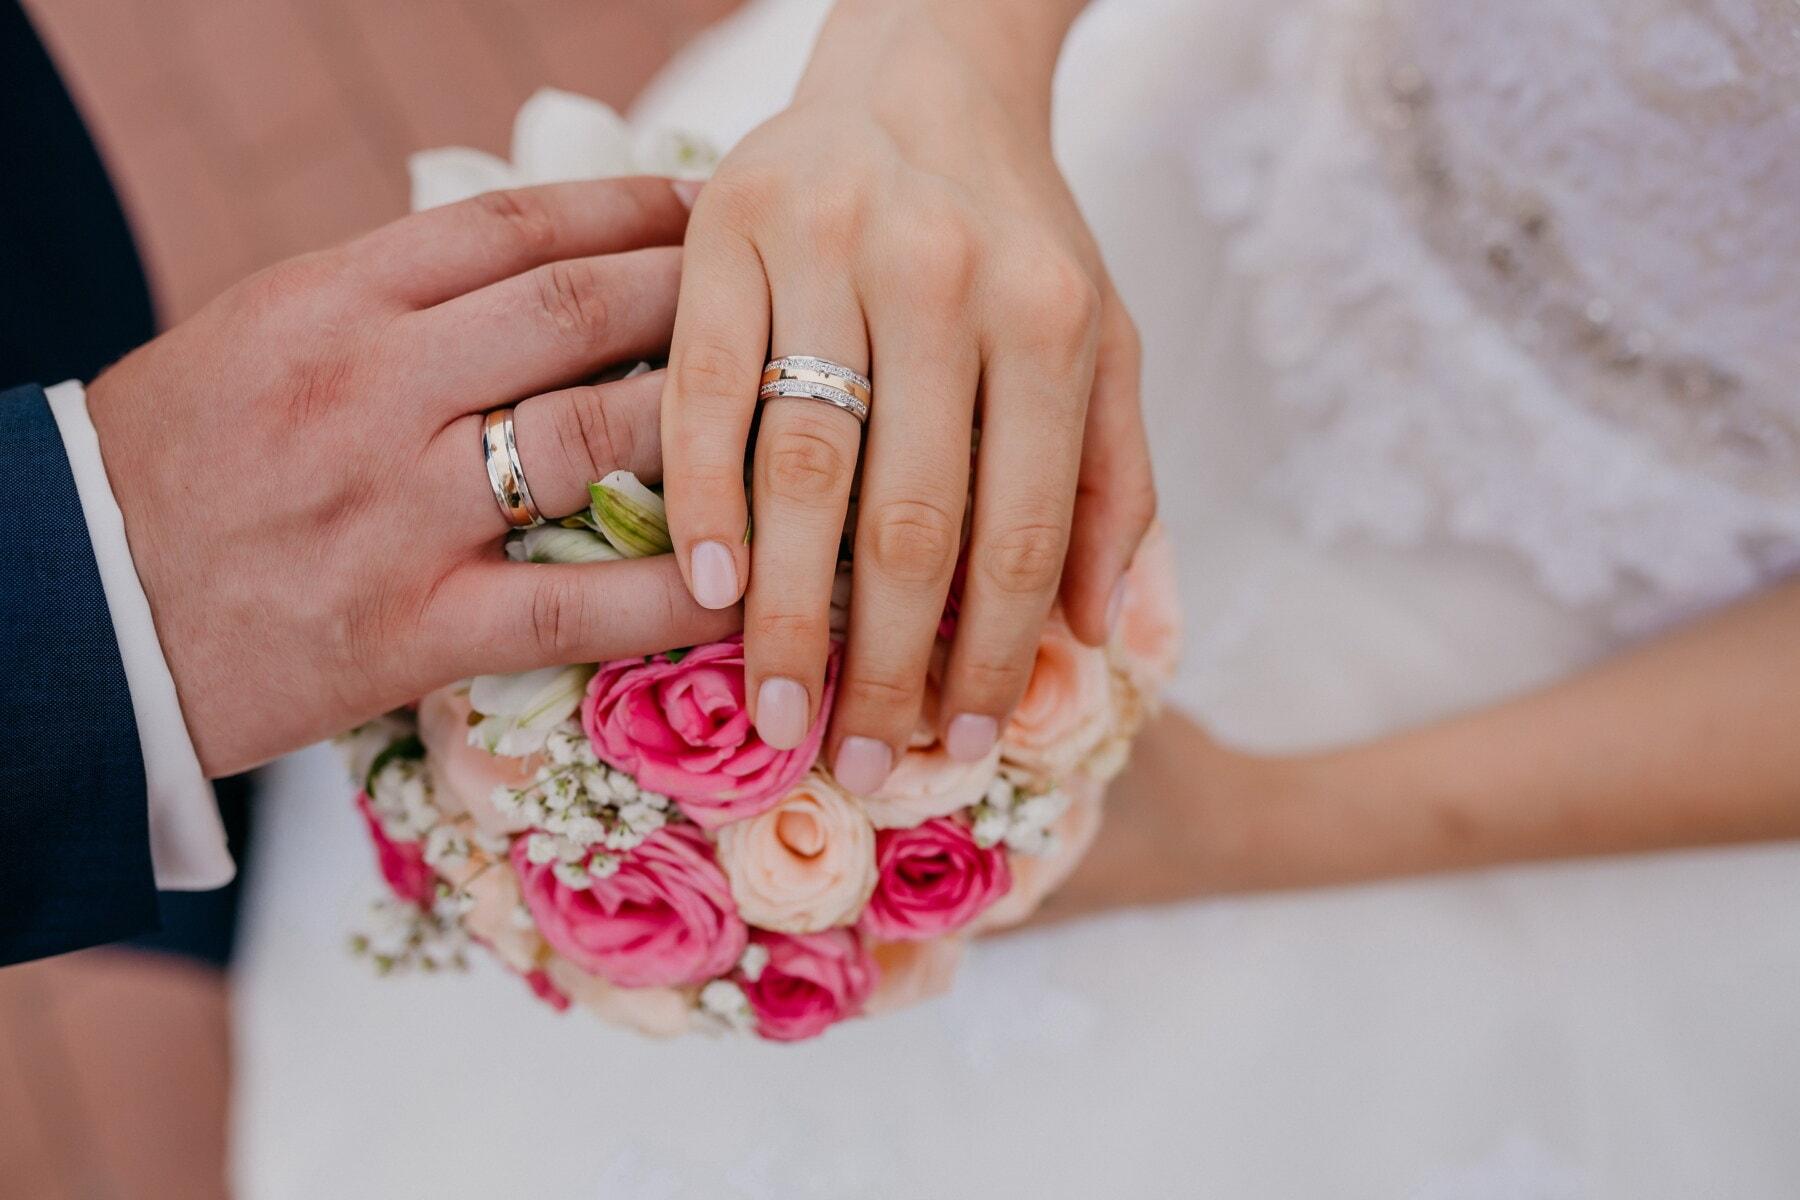 tomados de la mano, joyería, manos, anillo de bodas, boda, amor, ramo de novia, romántica, novia, novio